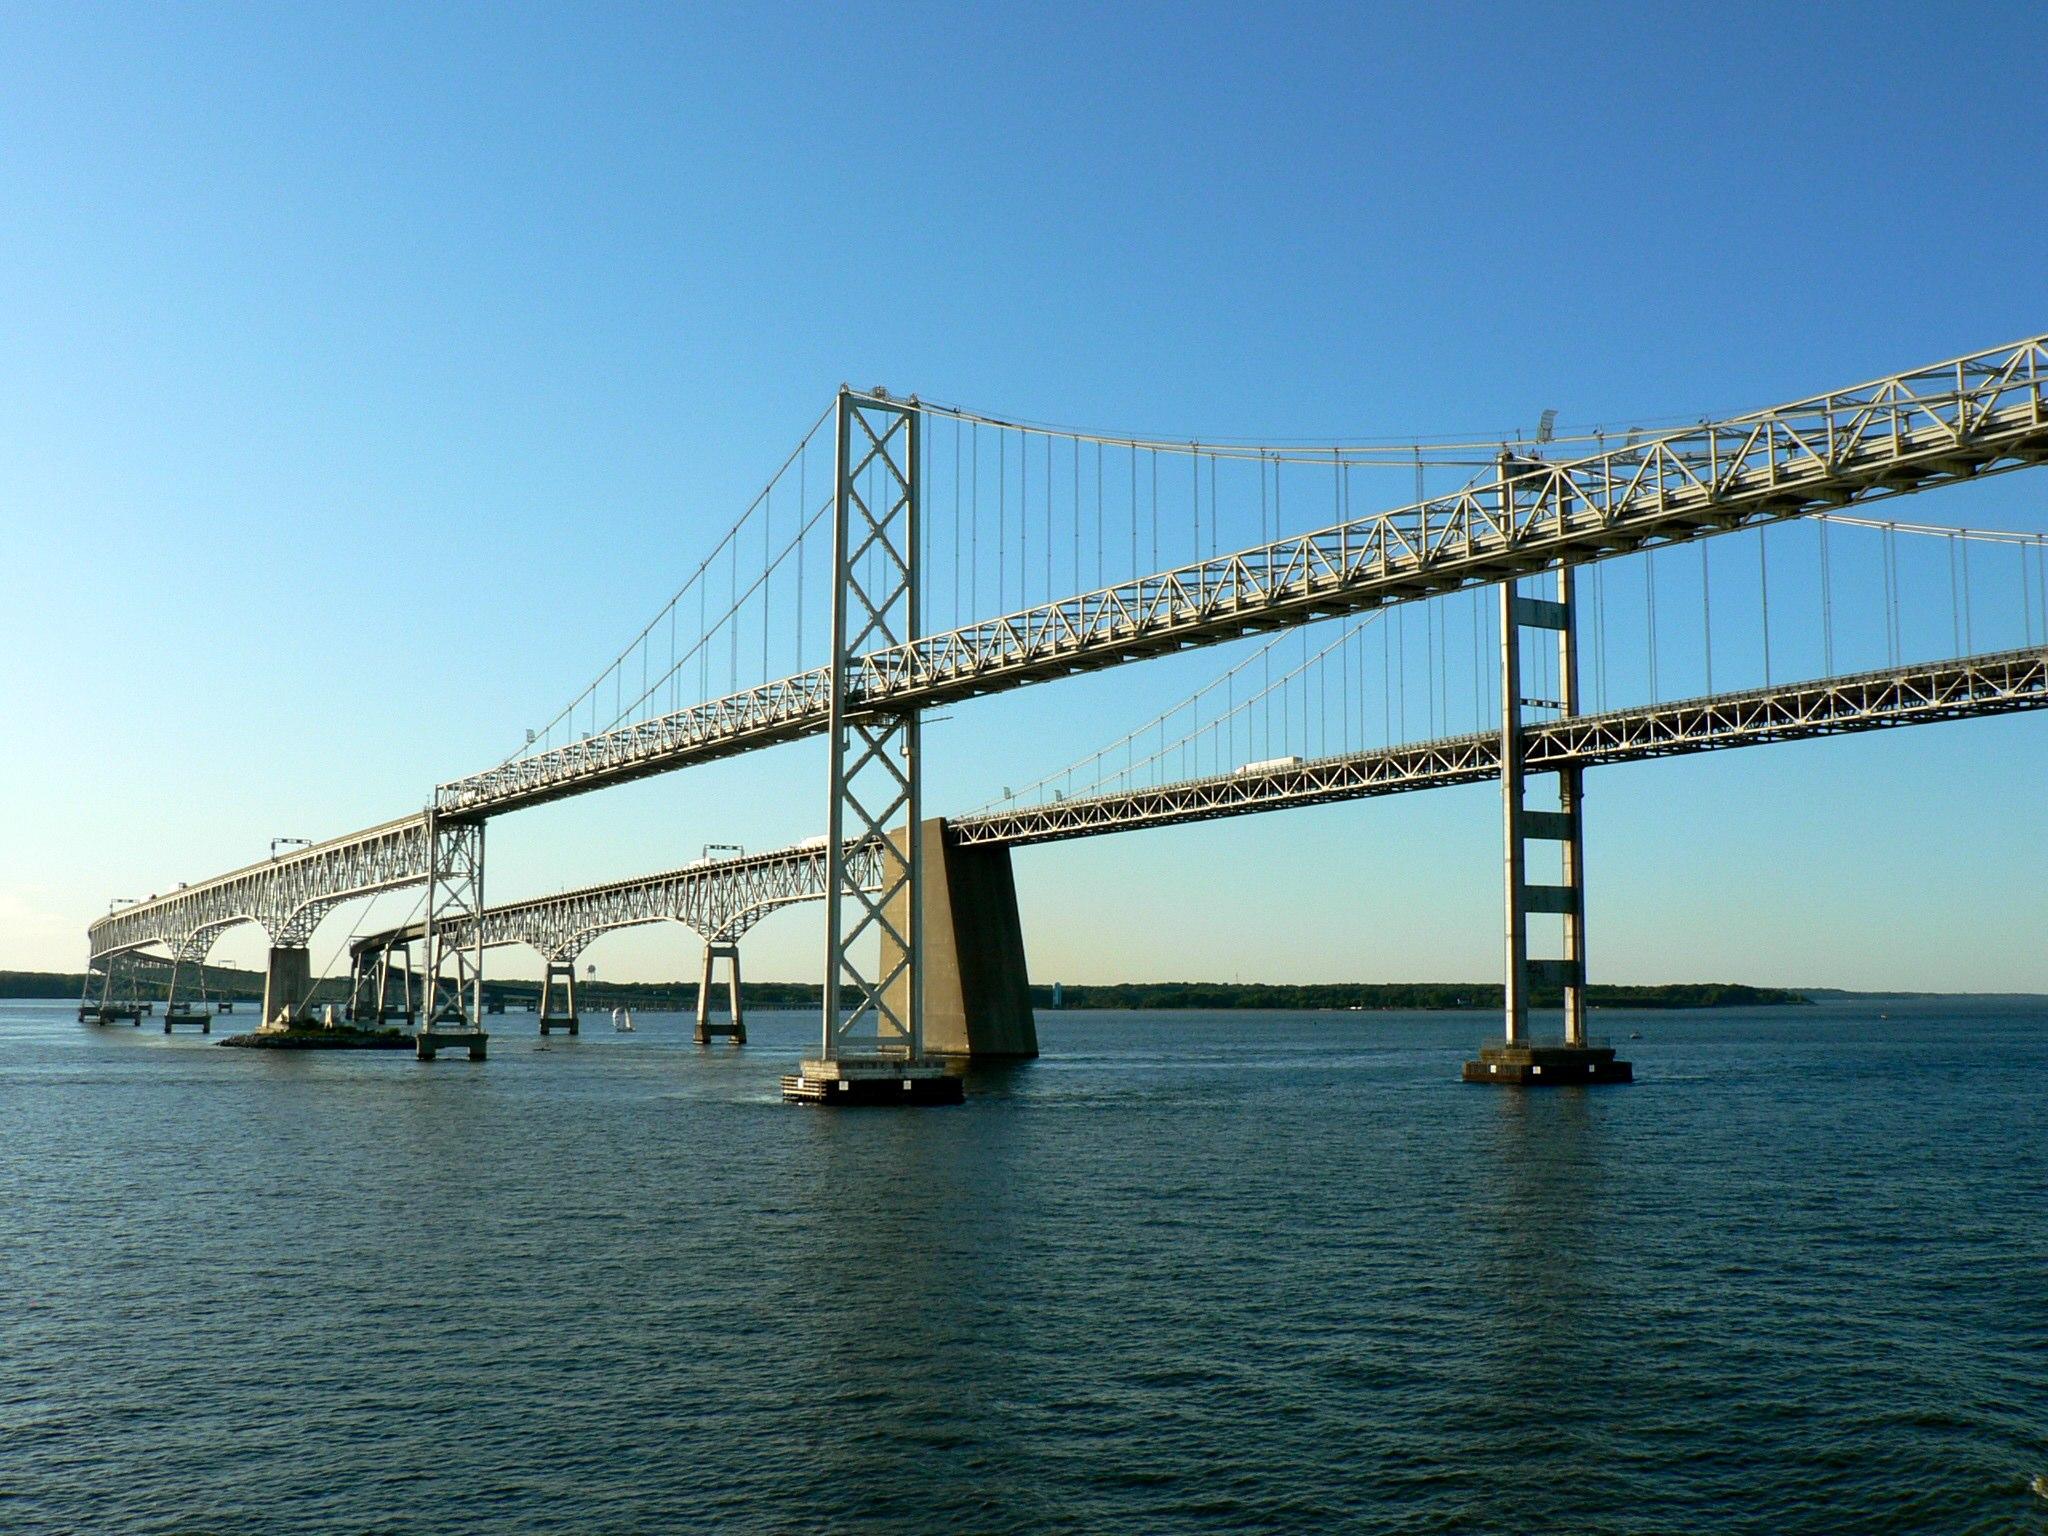 Chesapeake_Bay_Bridge1